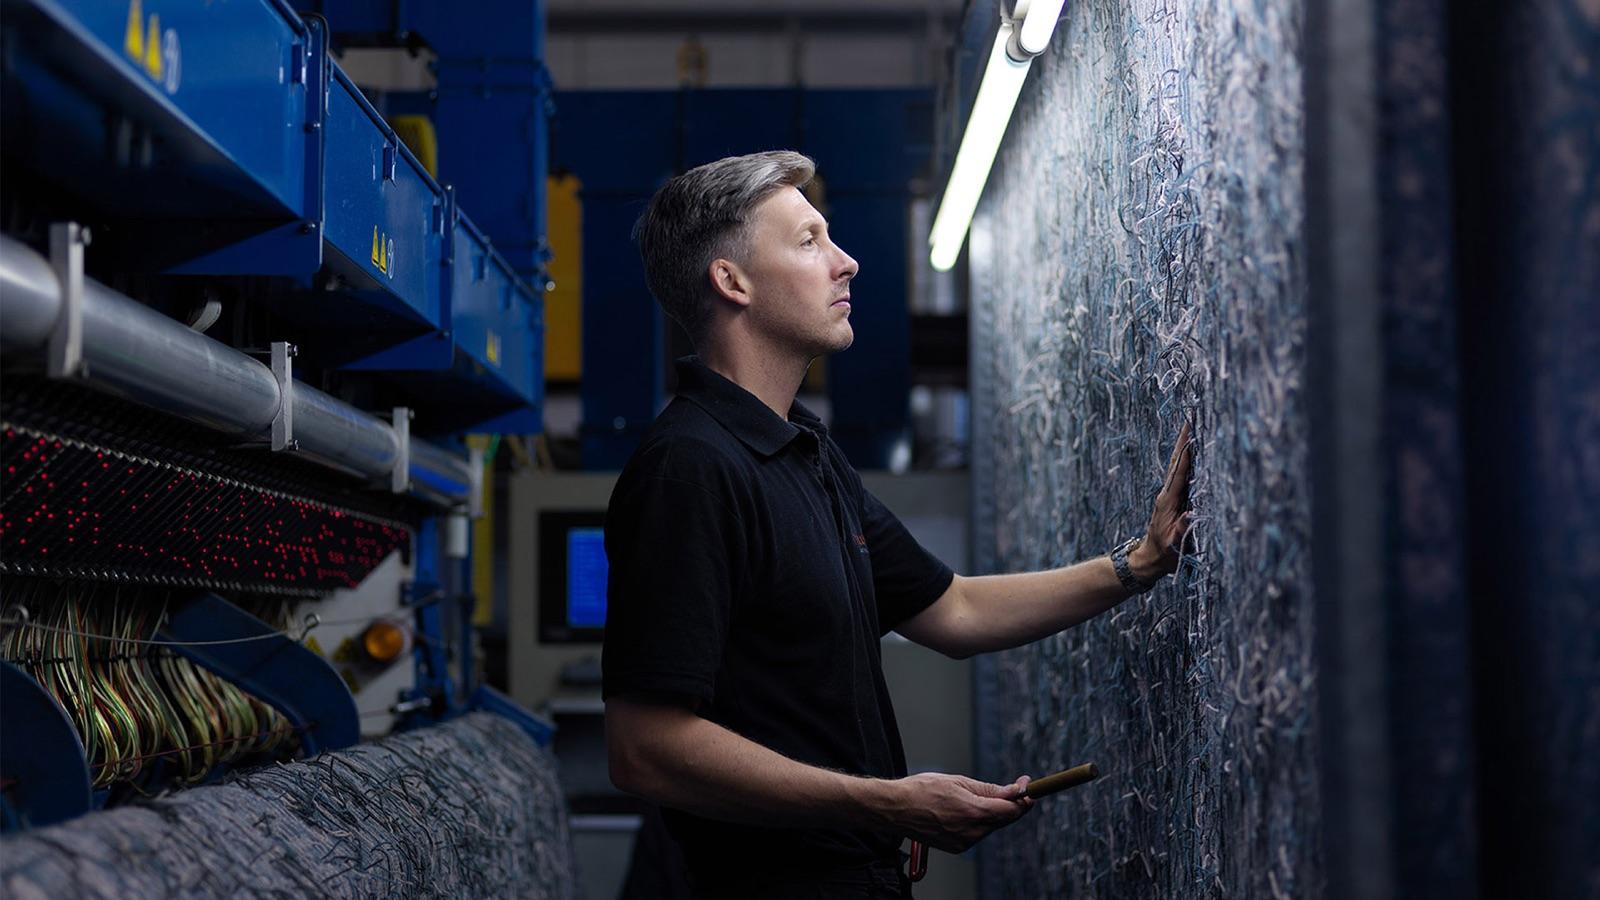 Newhey Carpets photography – Art Direction by Neil Holroyd Leeds based freelance designer